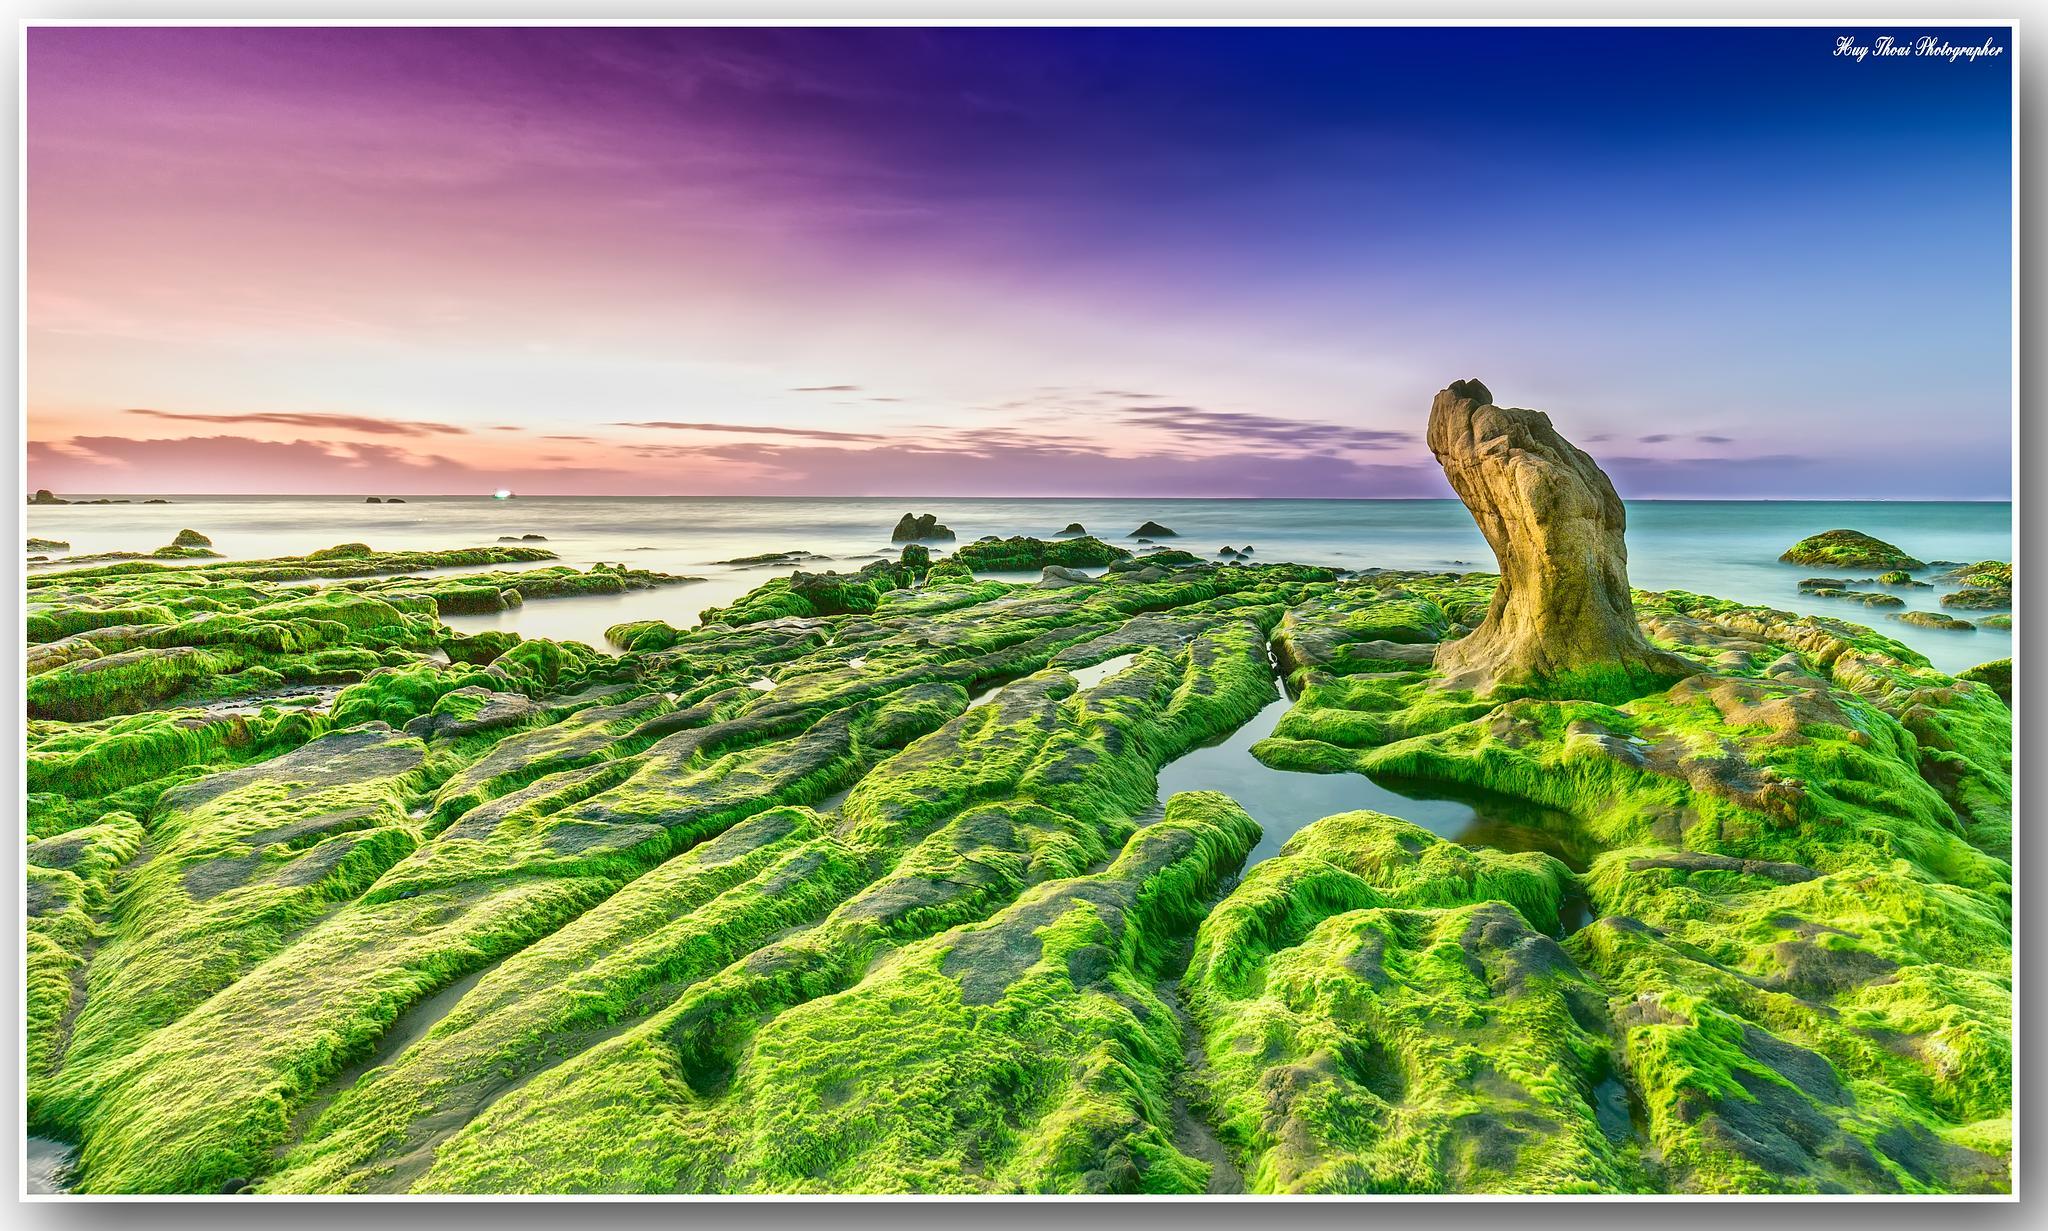 mossy stone deck by huythoai